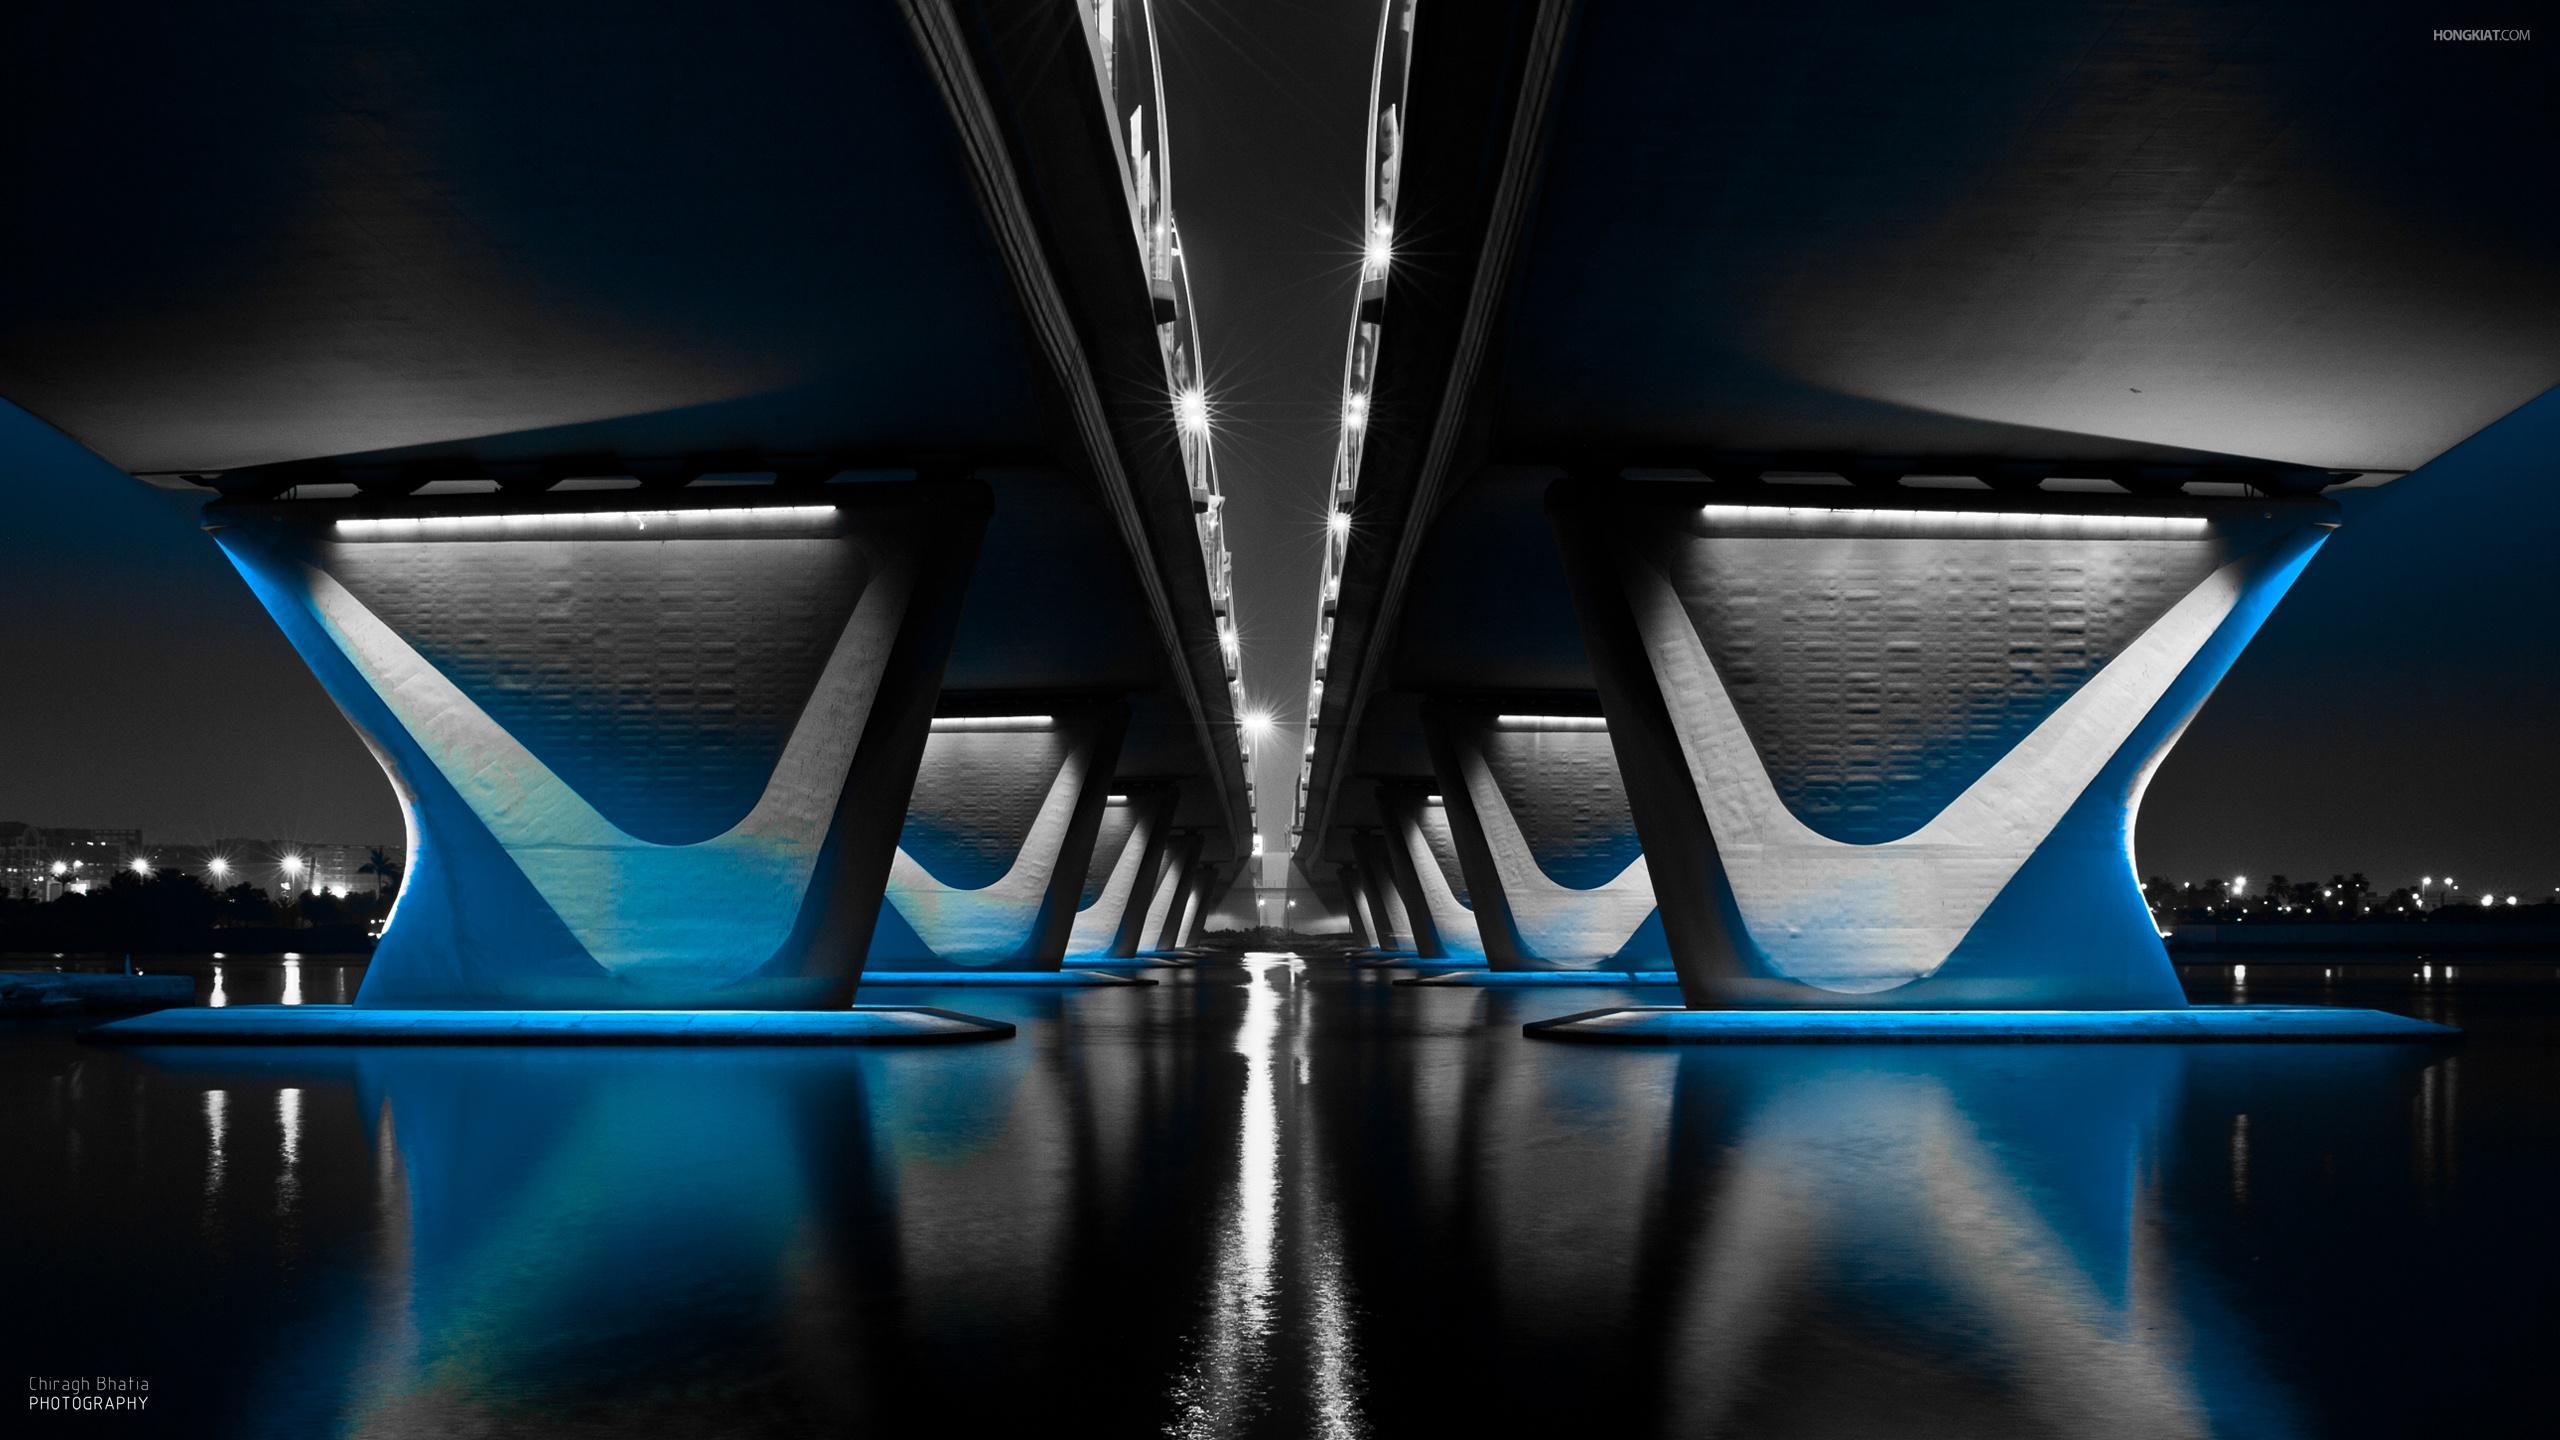 MidNight Bridge Wallpapers HD Wallpapers 2560x1440